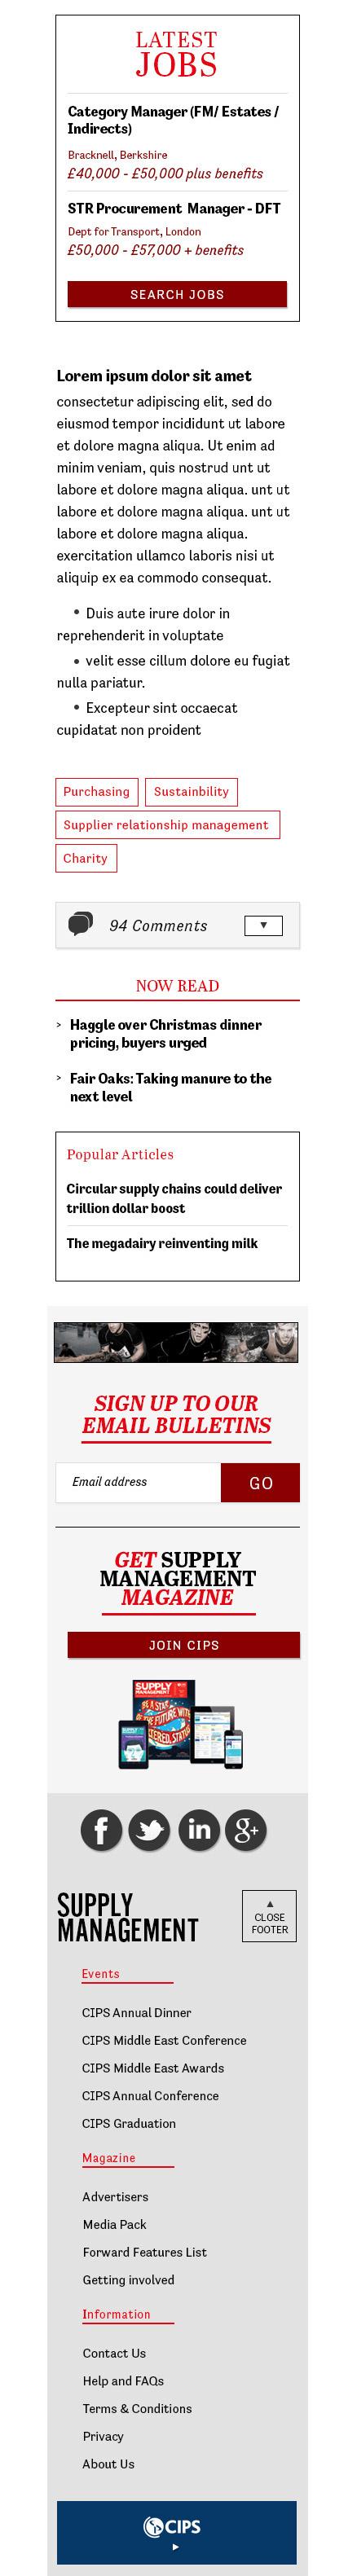 SM-website-article-mobile2